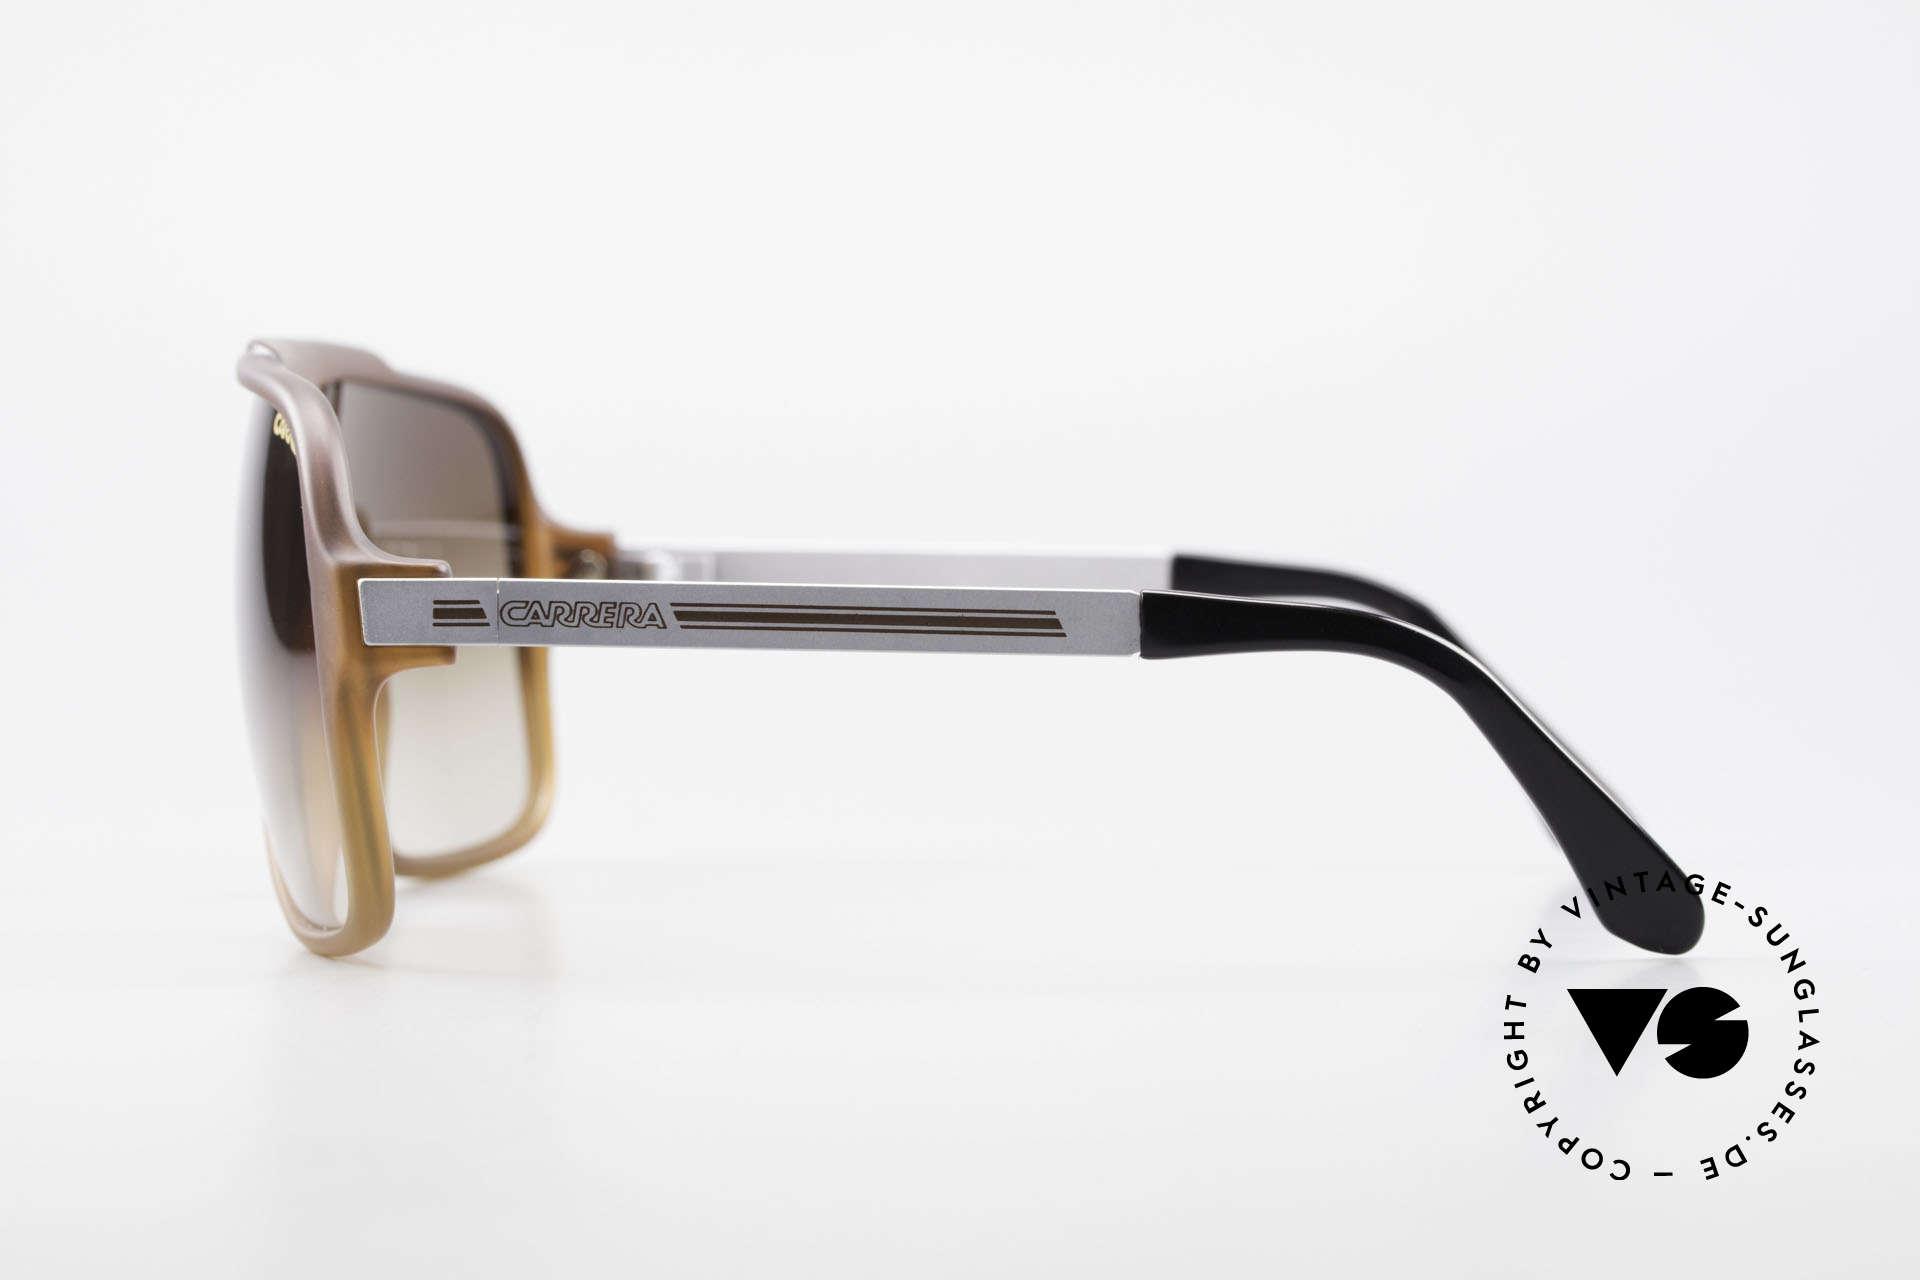 Carrera 5557 Rare Vintage Shades No Retro, unworn (like all our RARE vintage Carrera sunglasses), Made for Men